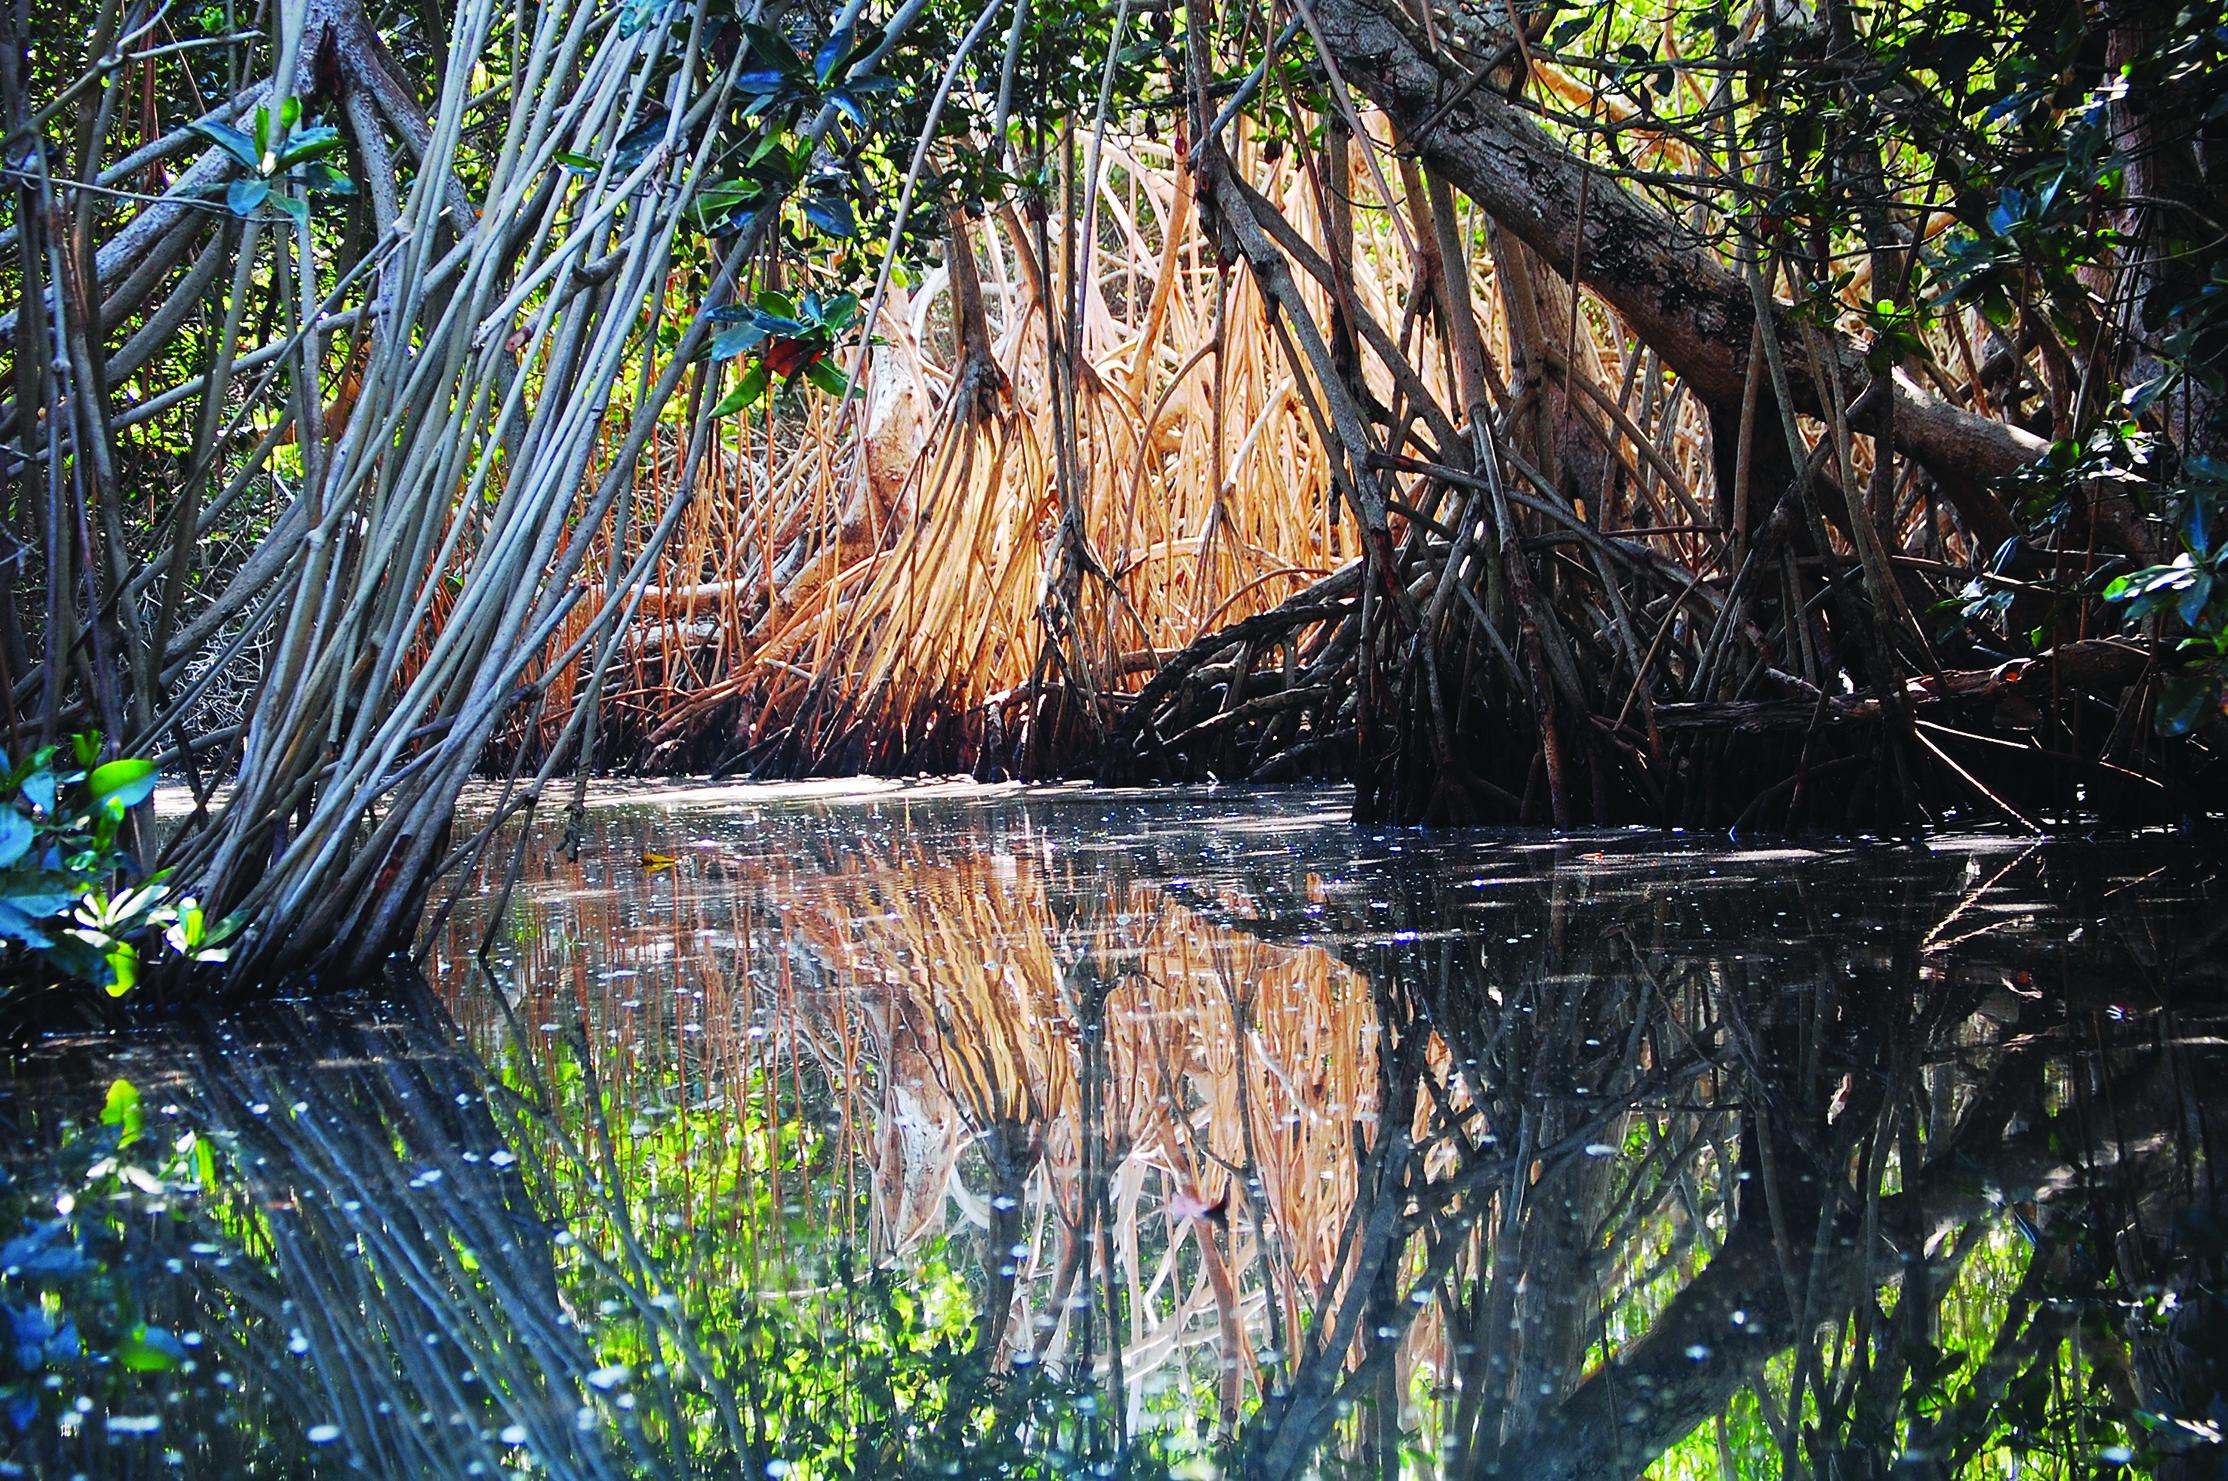 Thick-mangroves-line-the-dinghy-jungle-tour-at-Tenacatita